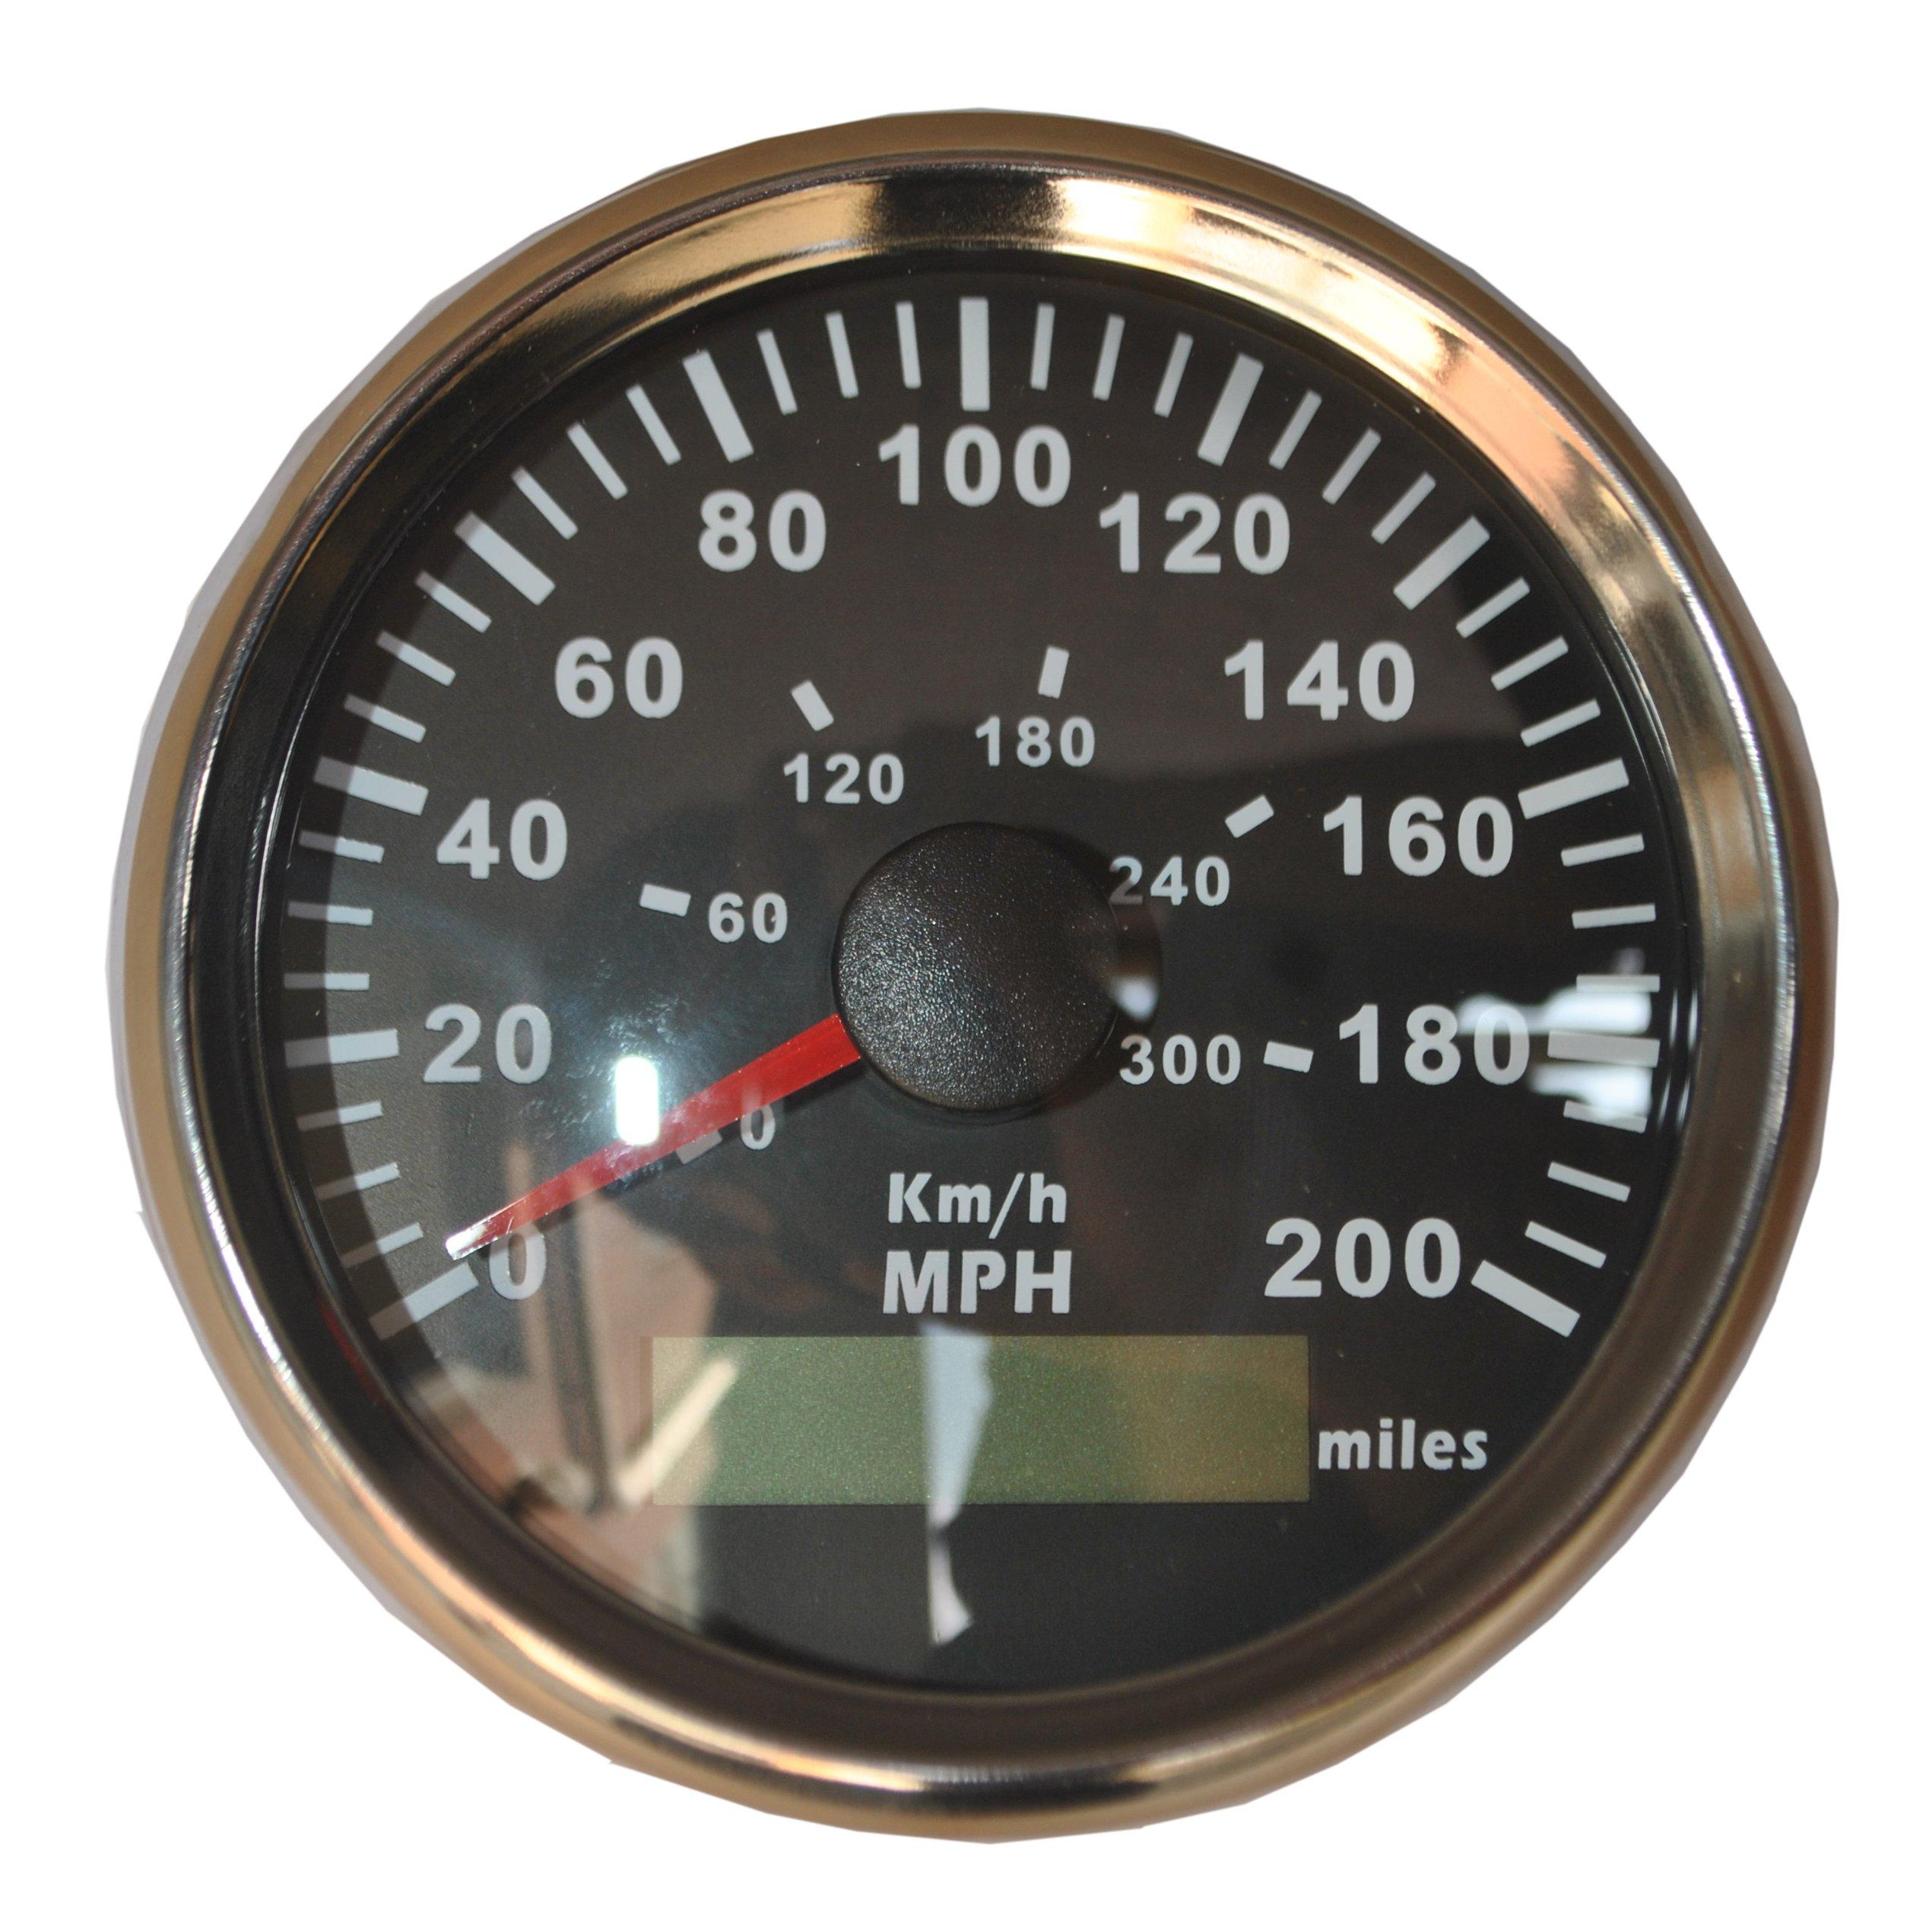 GPS KM/H MPH Miles Speedometer Gauge Odometer ATV UTV Motorcycle Marine Boat Buggy Golf Chrome Bezel Black Panel